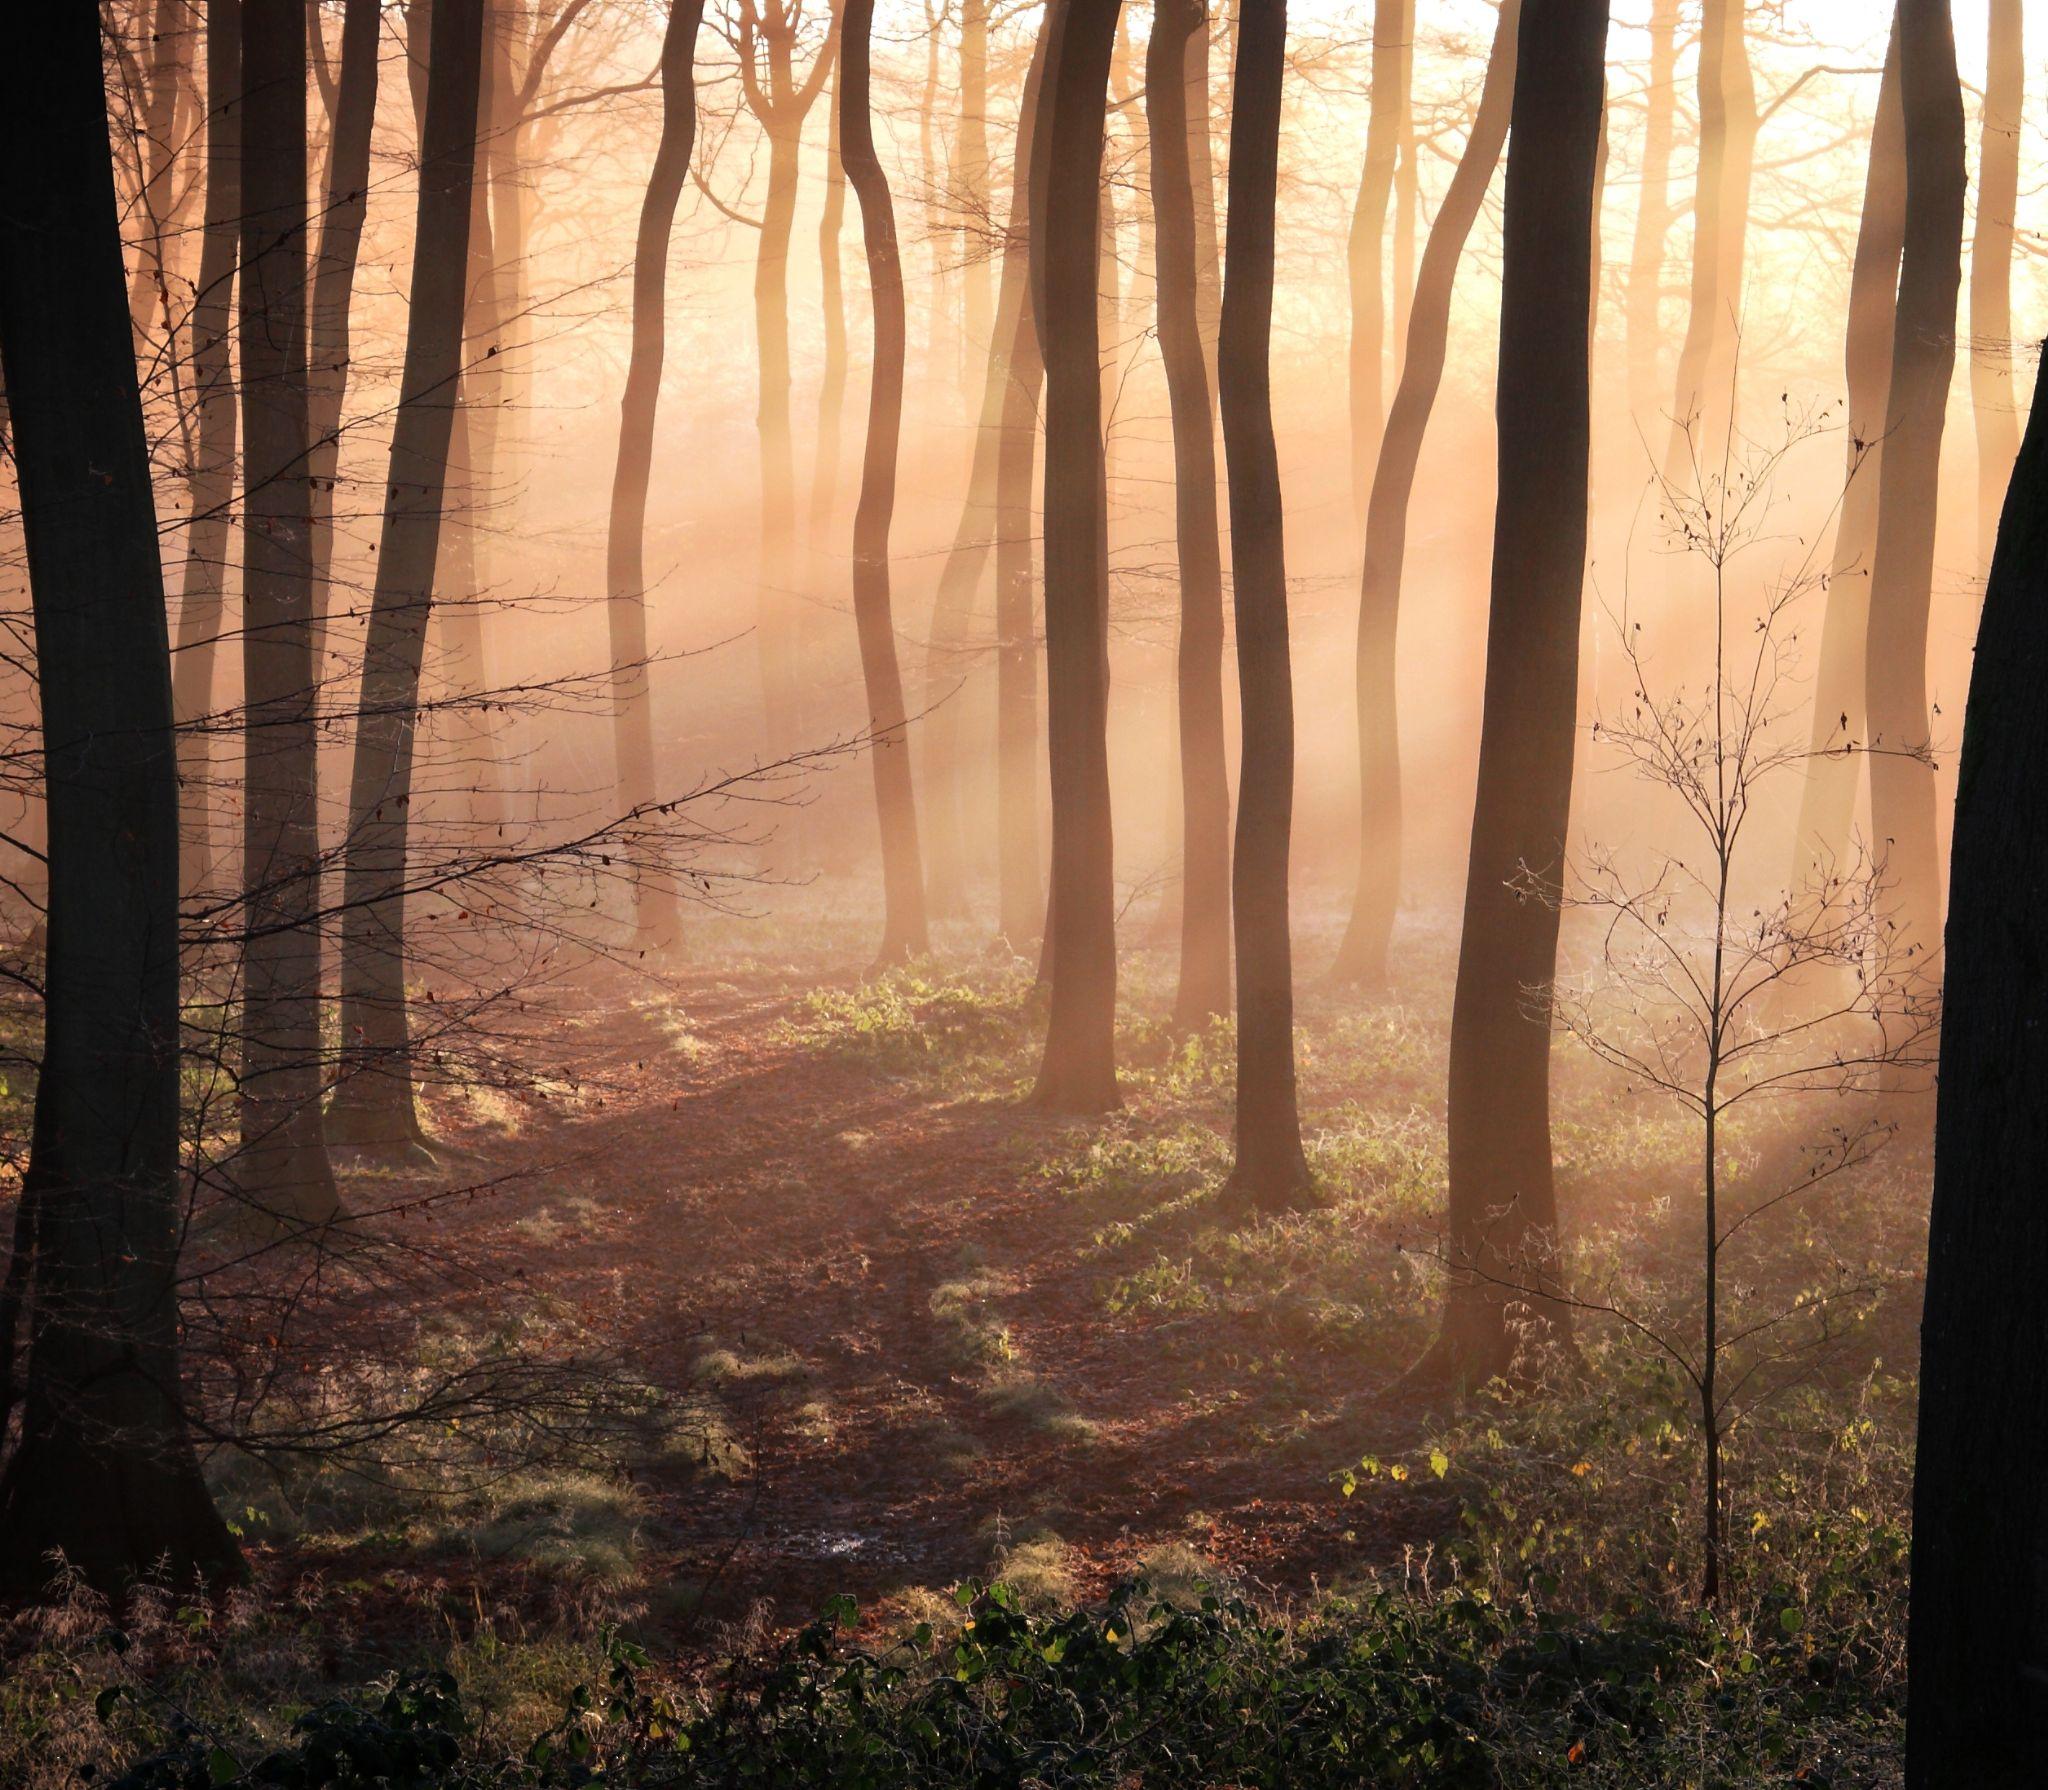 Winter Woodland Light by cerijones14019